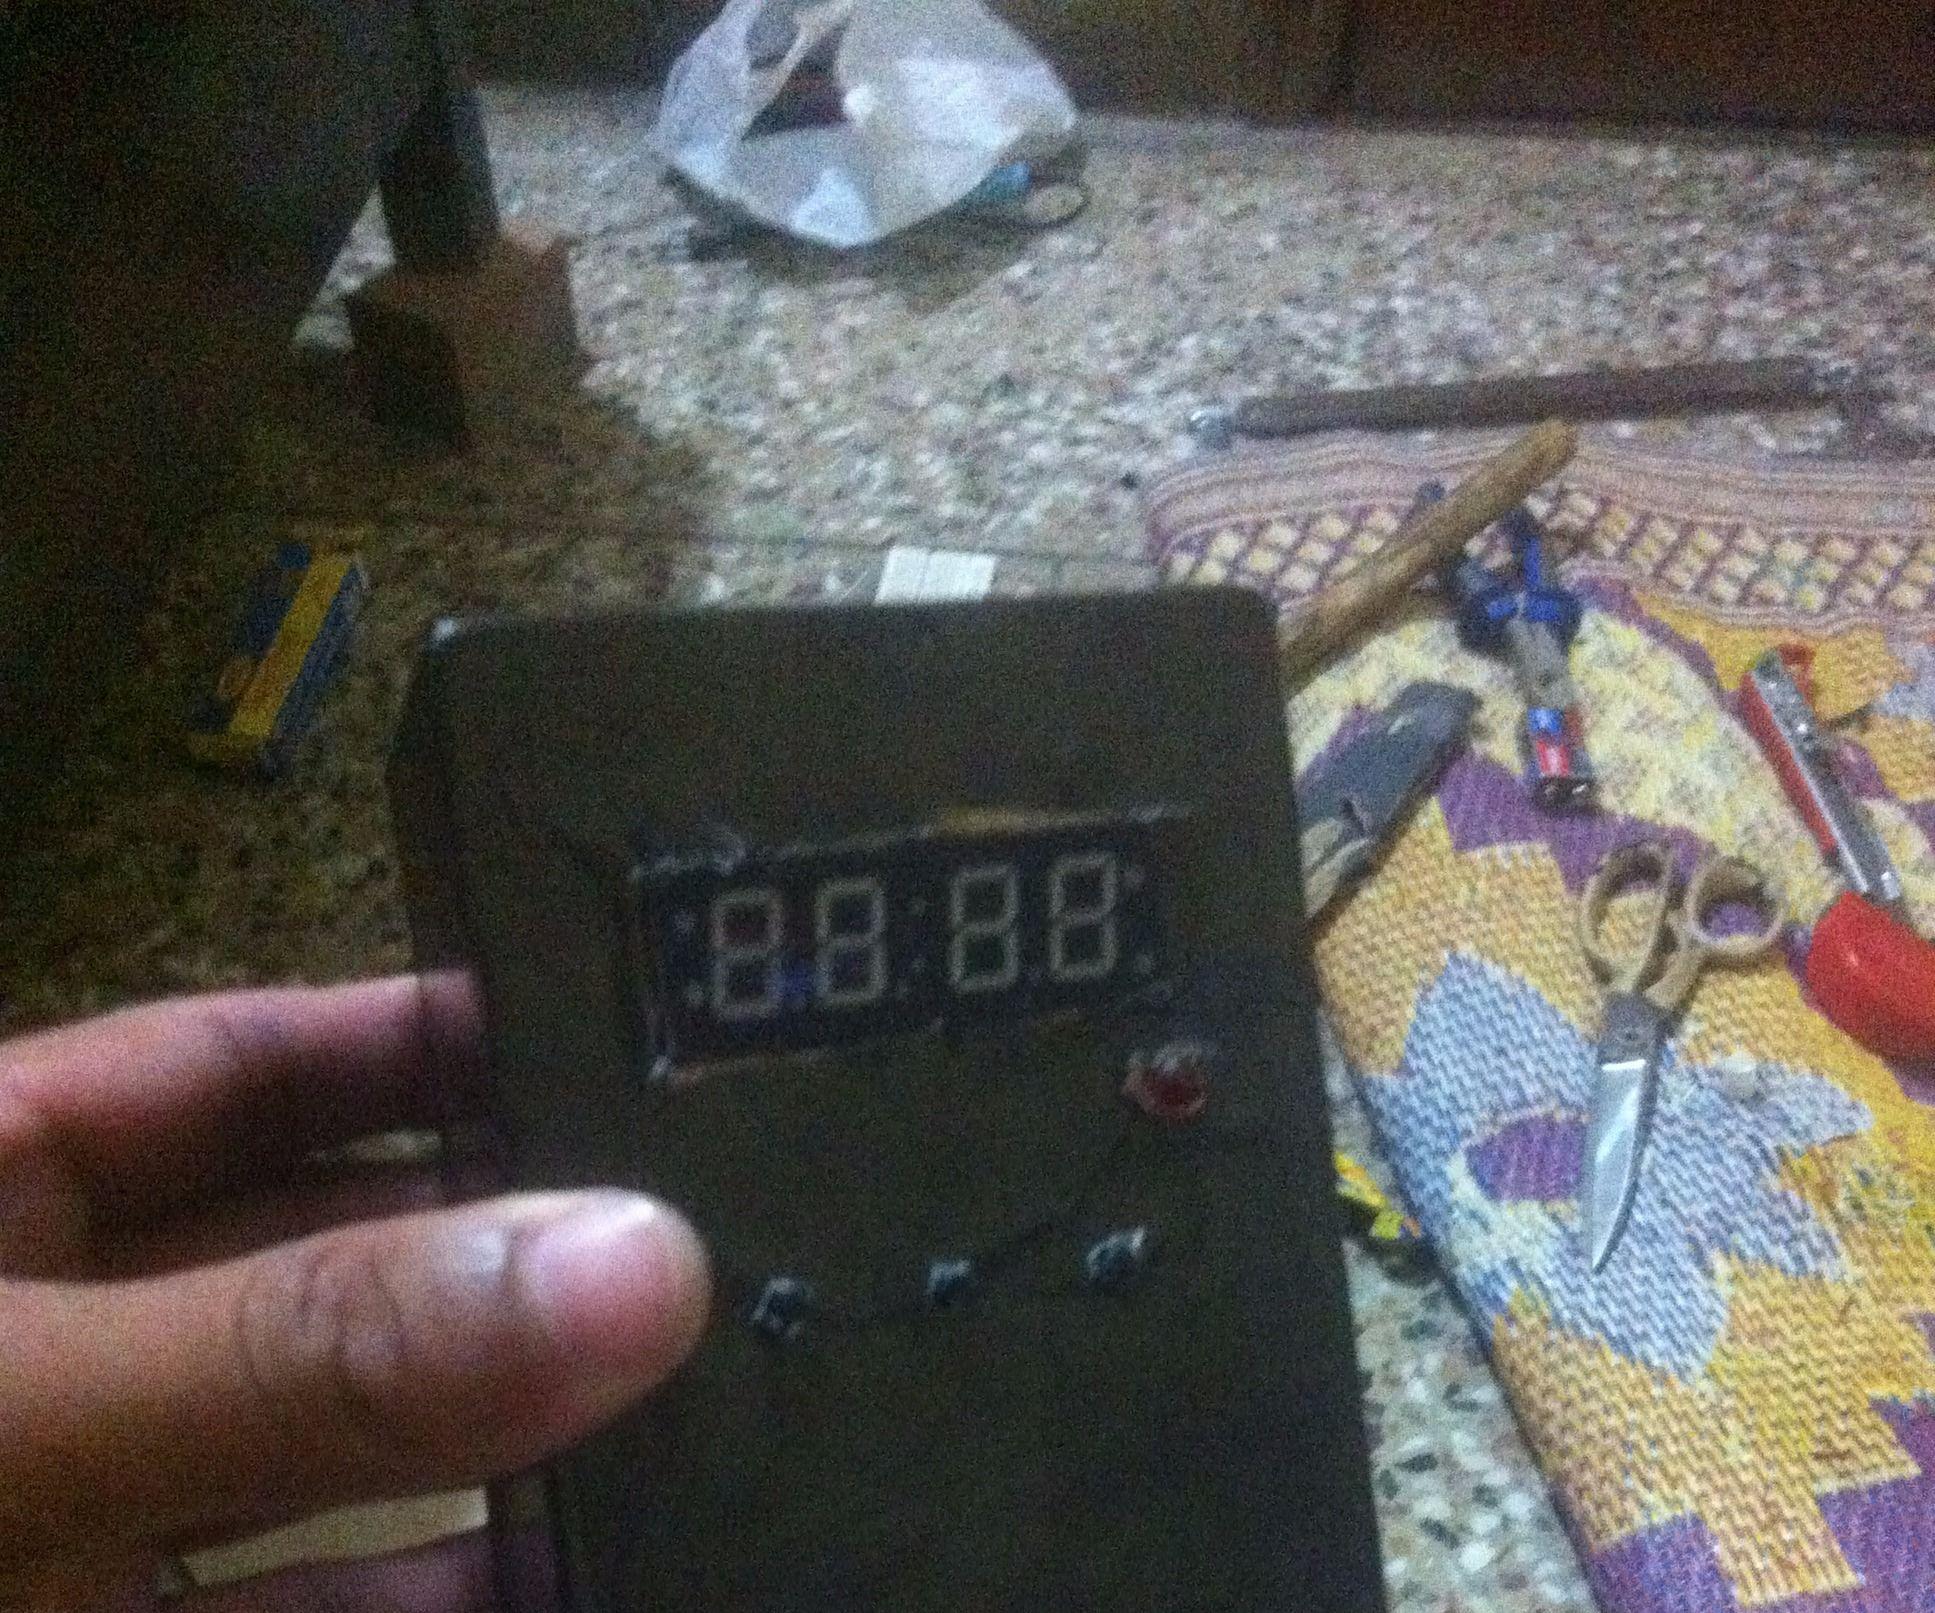 Digital Clock using Arduino